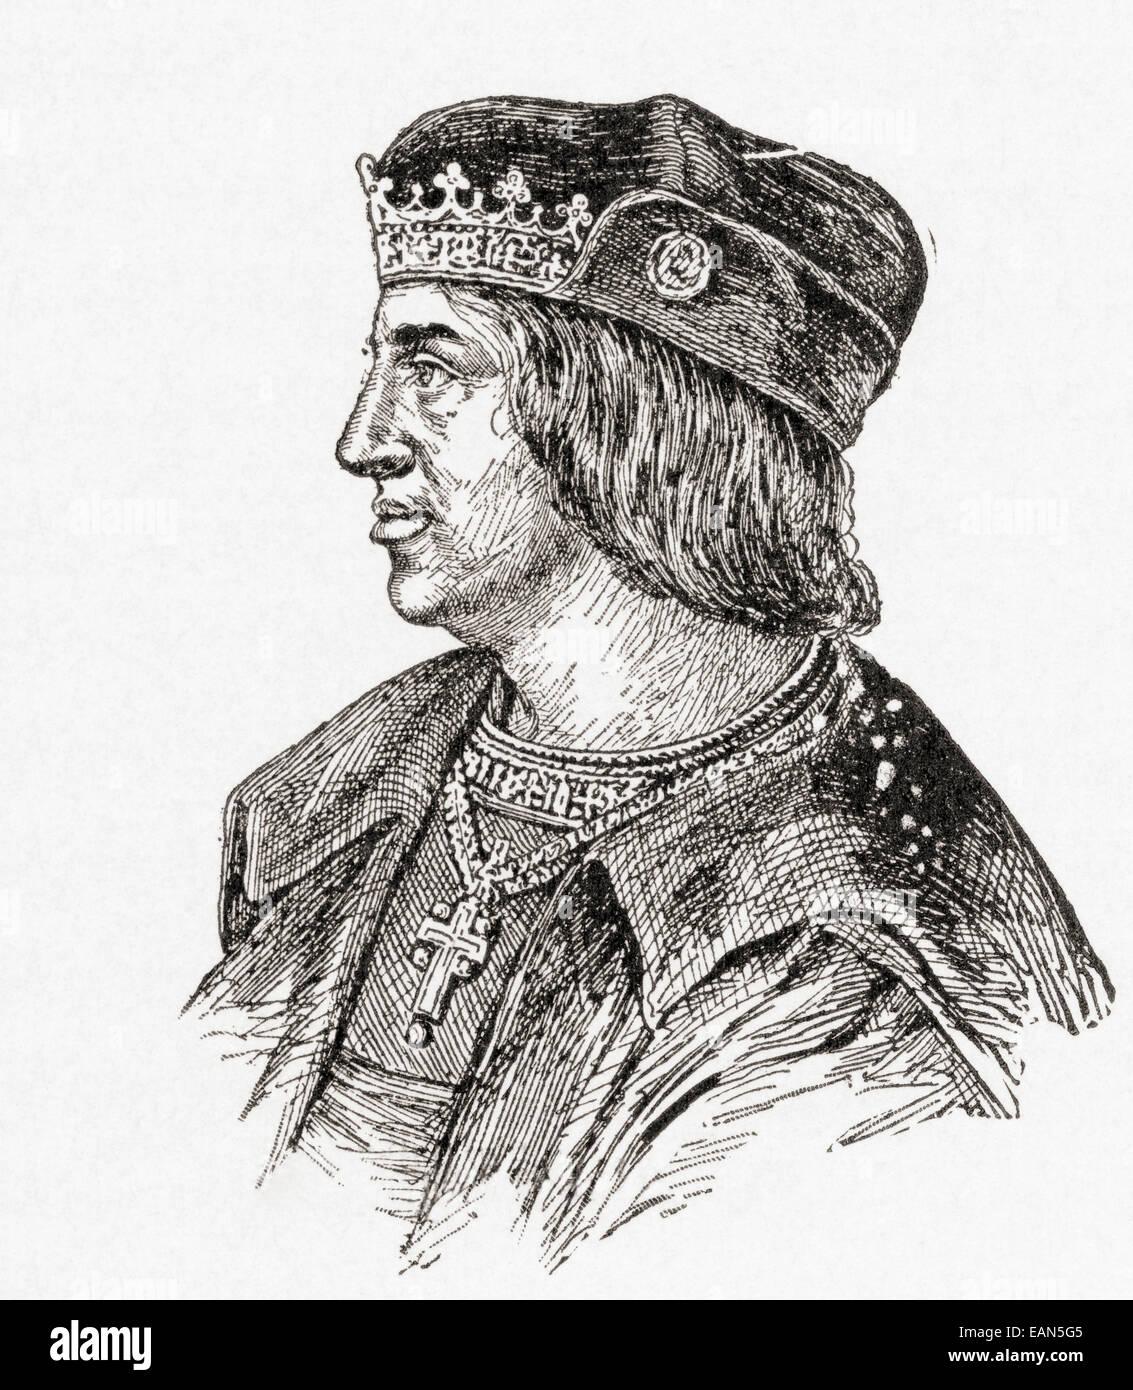 Ferdinand II of Aragon, Ferdinand the Catholic, 1452 – 1516. - Stock Image